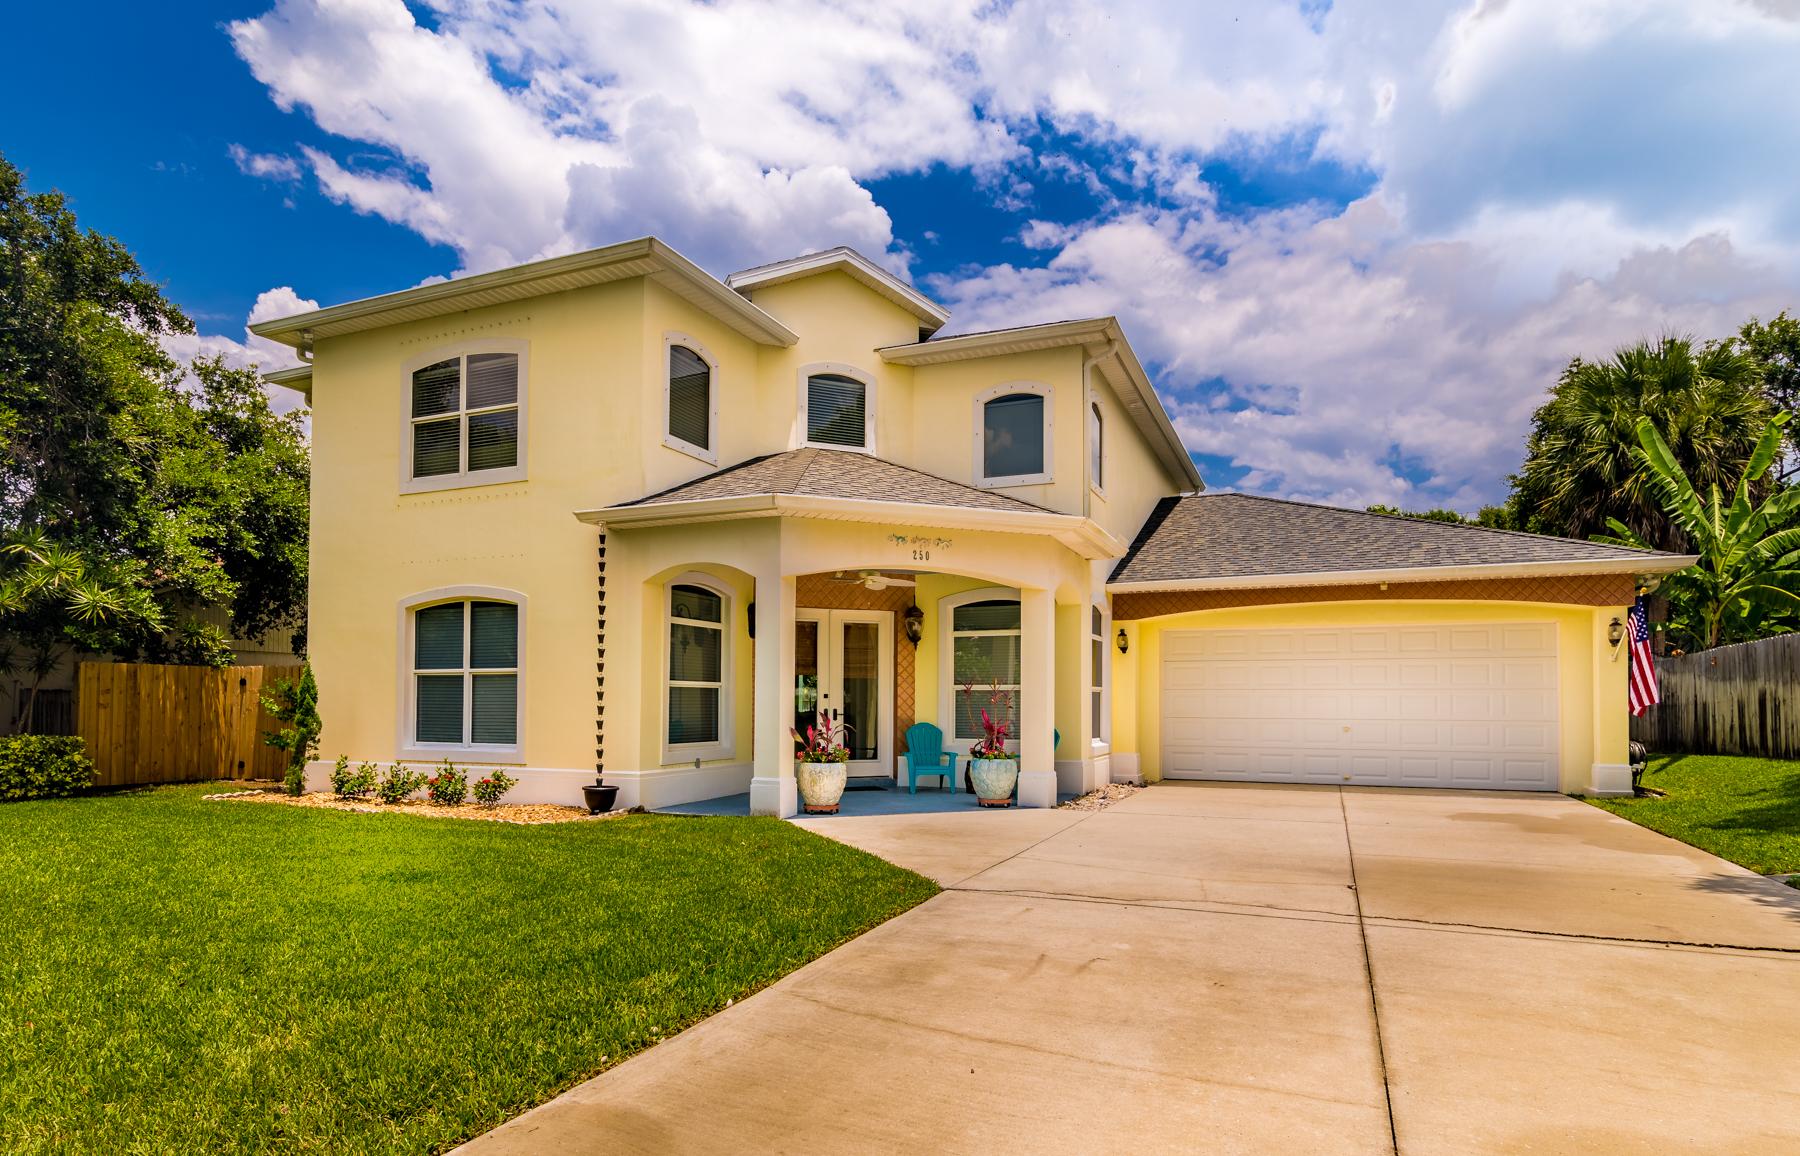 Open & Bright Home with Deeded Beach Access 250 Heron Drive Melbourne Beach, Florida 32951 Hoa Kỳ